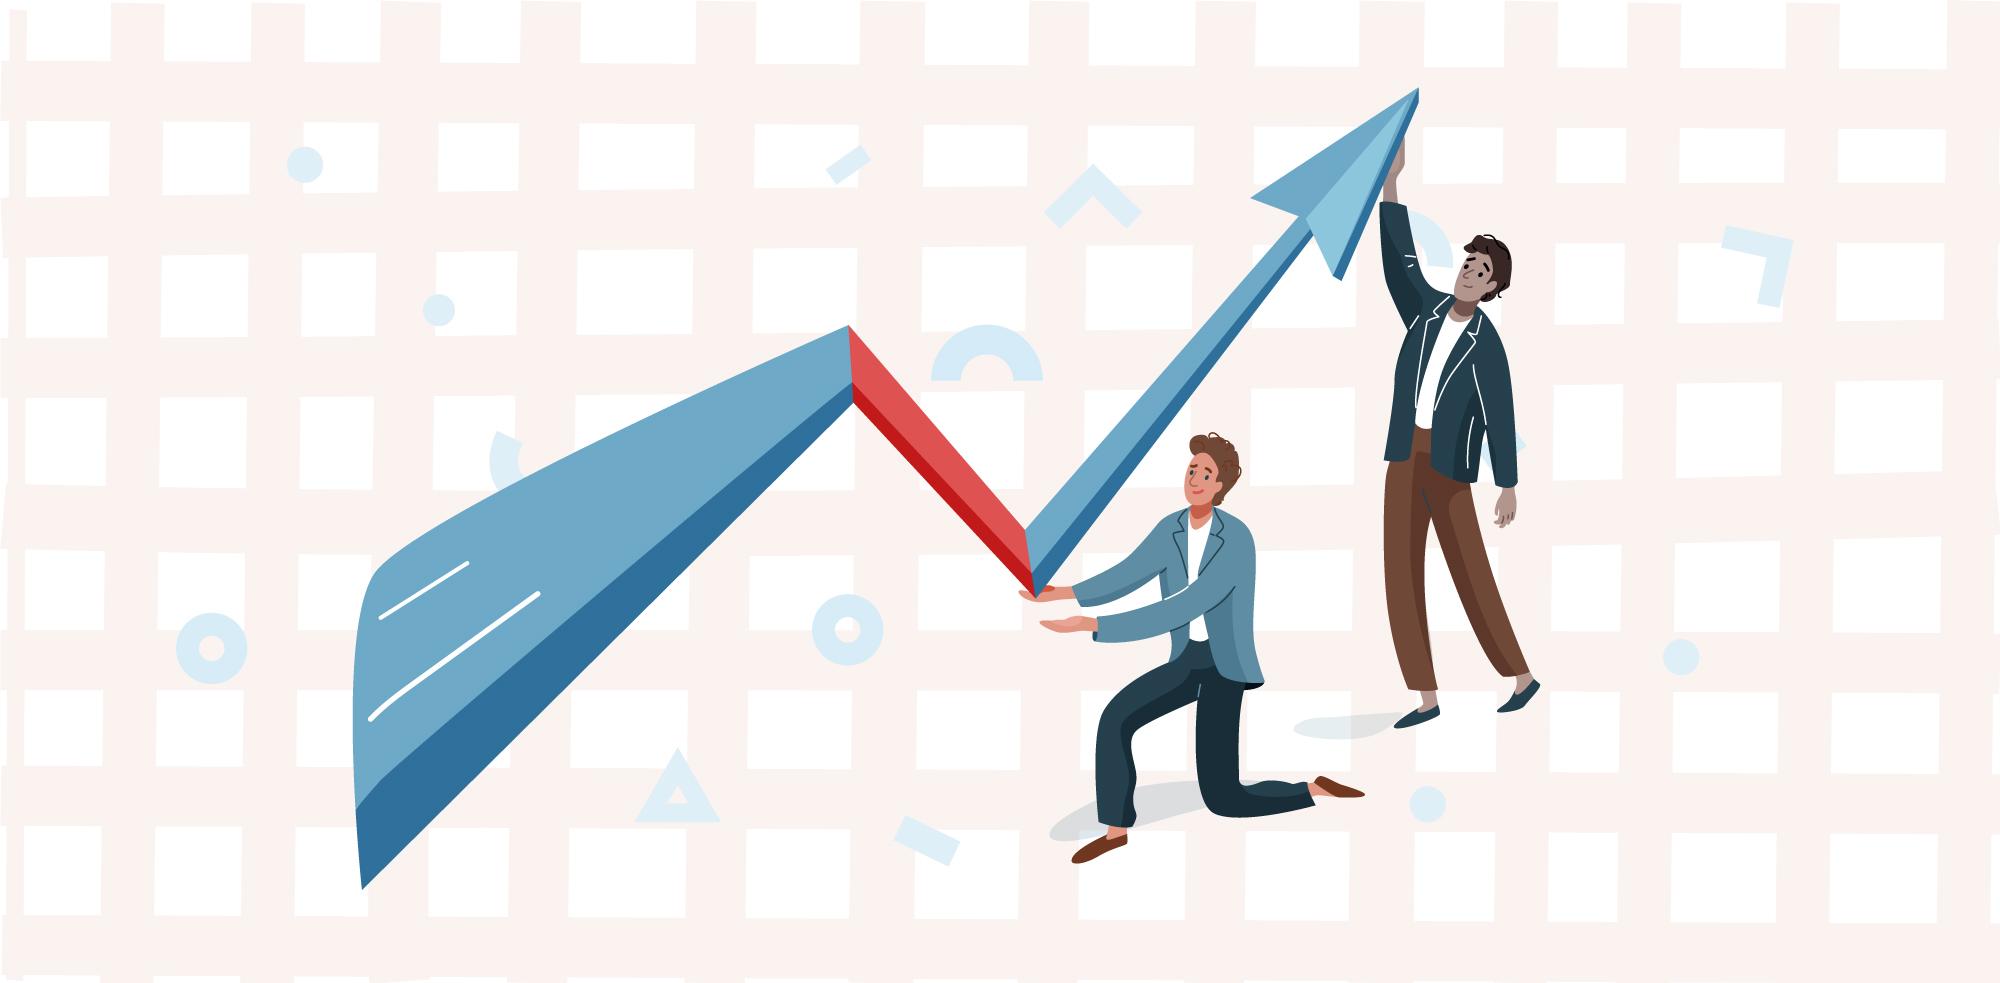 Illustration of market slump